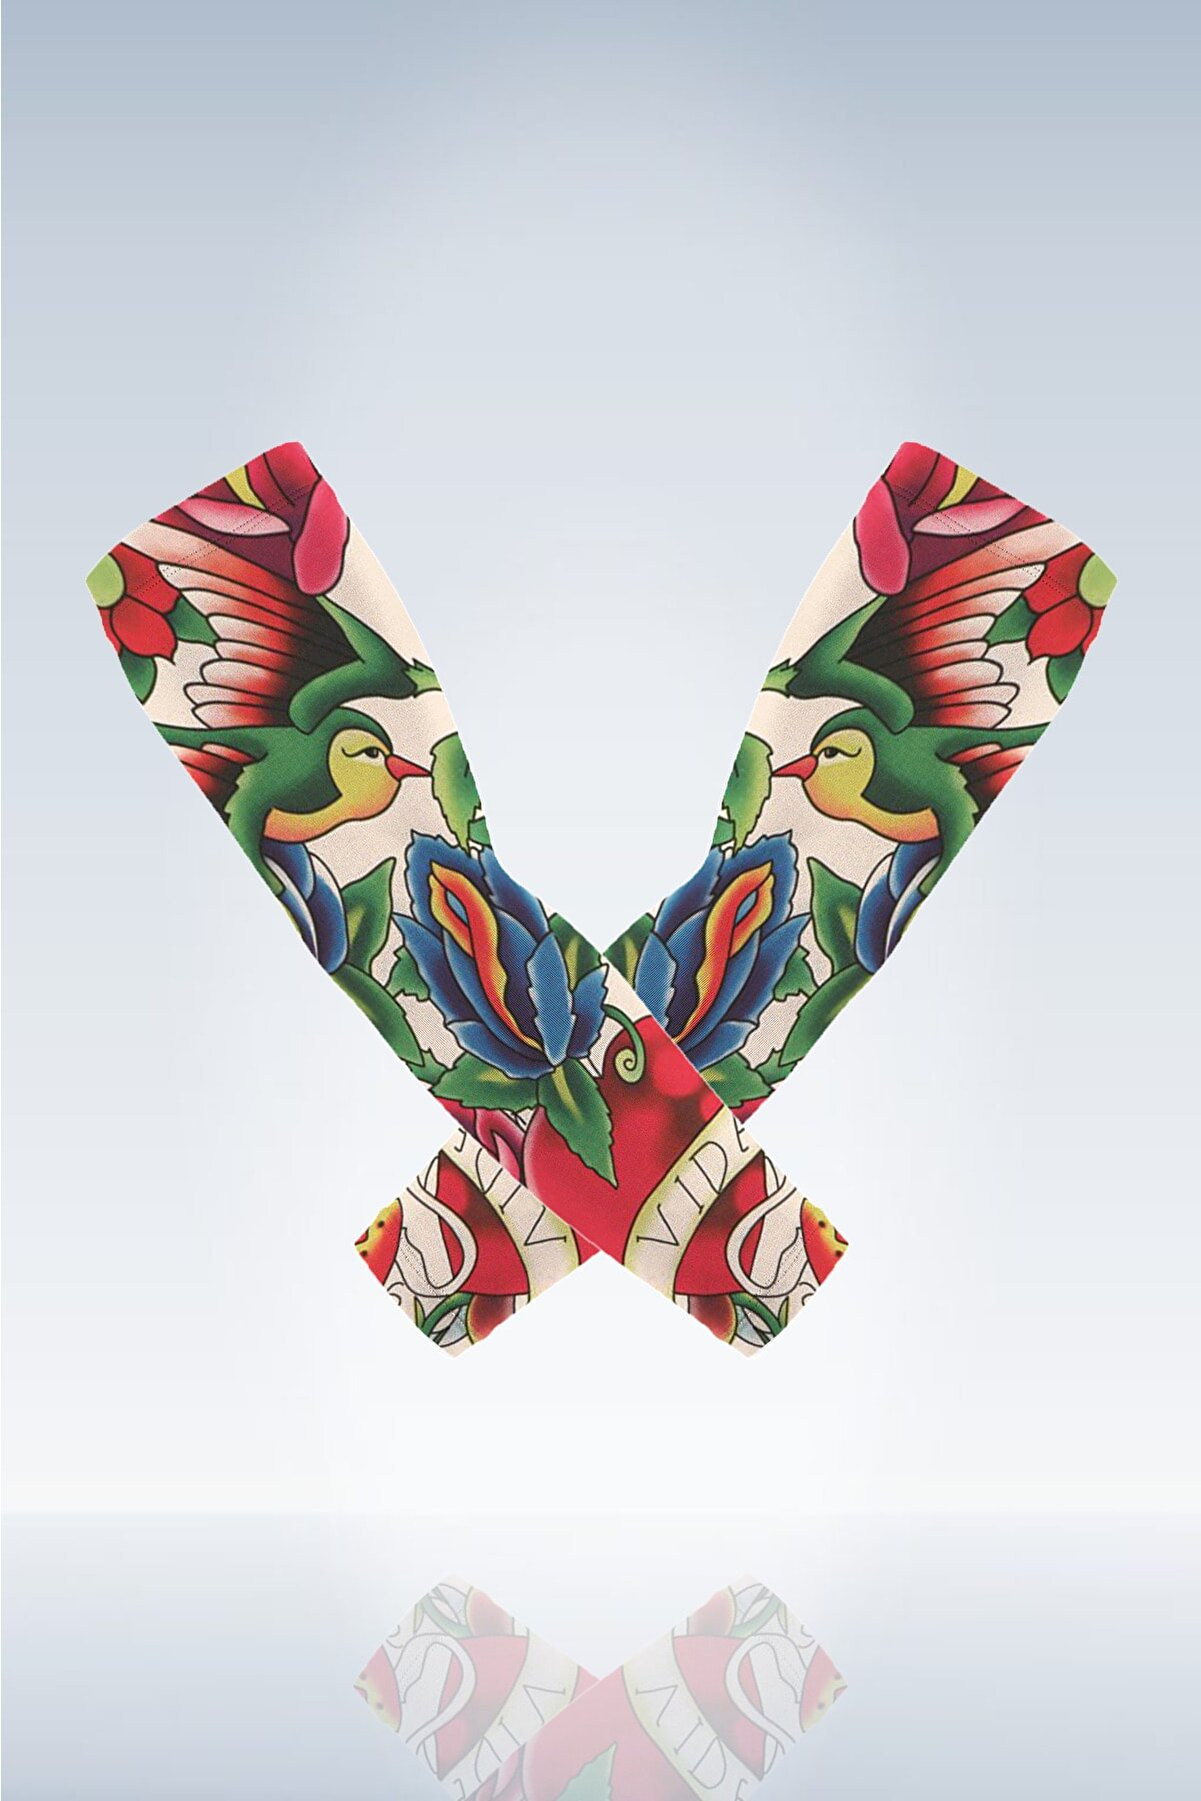 BP Tattoo Martin Giyilebilir Dövme Çorap Tattoo (2'li Set)